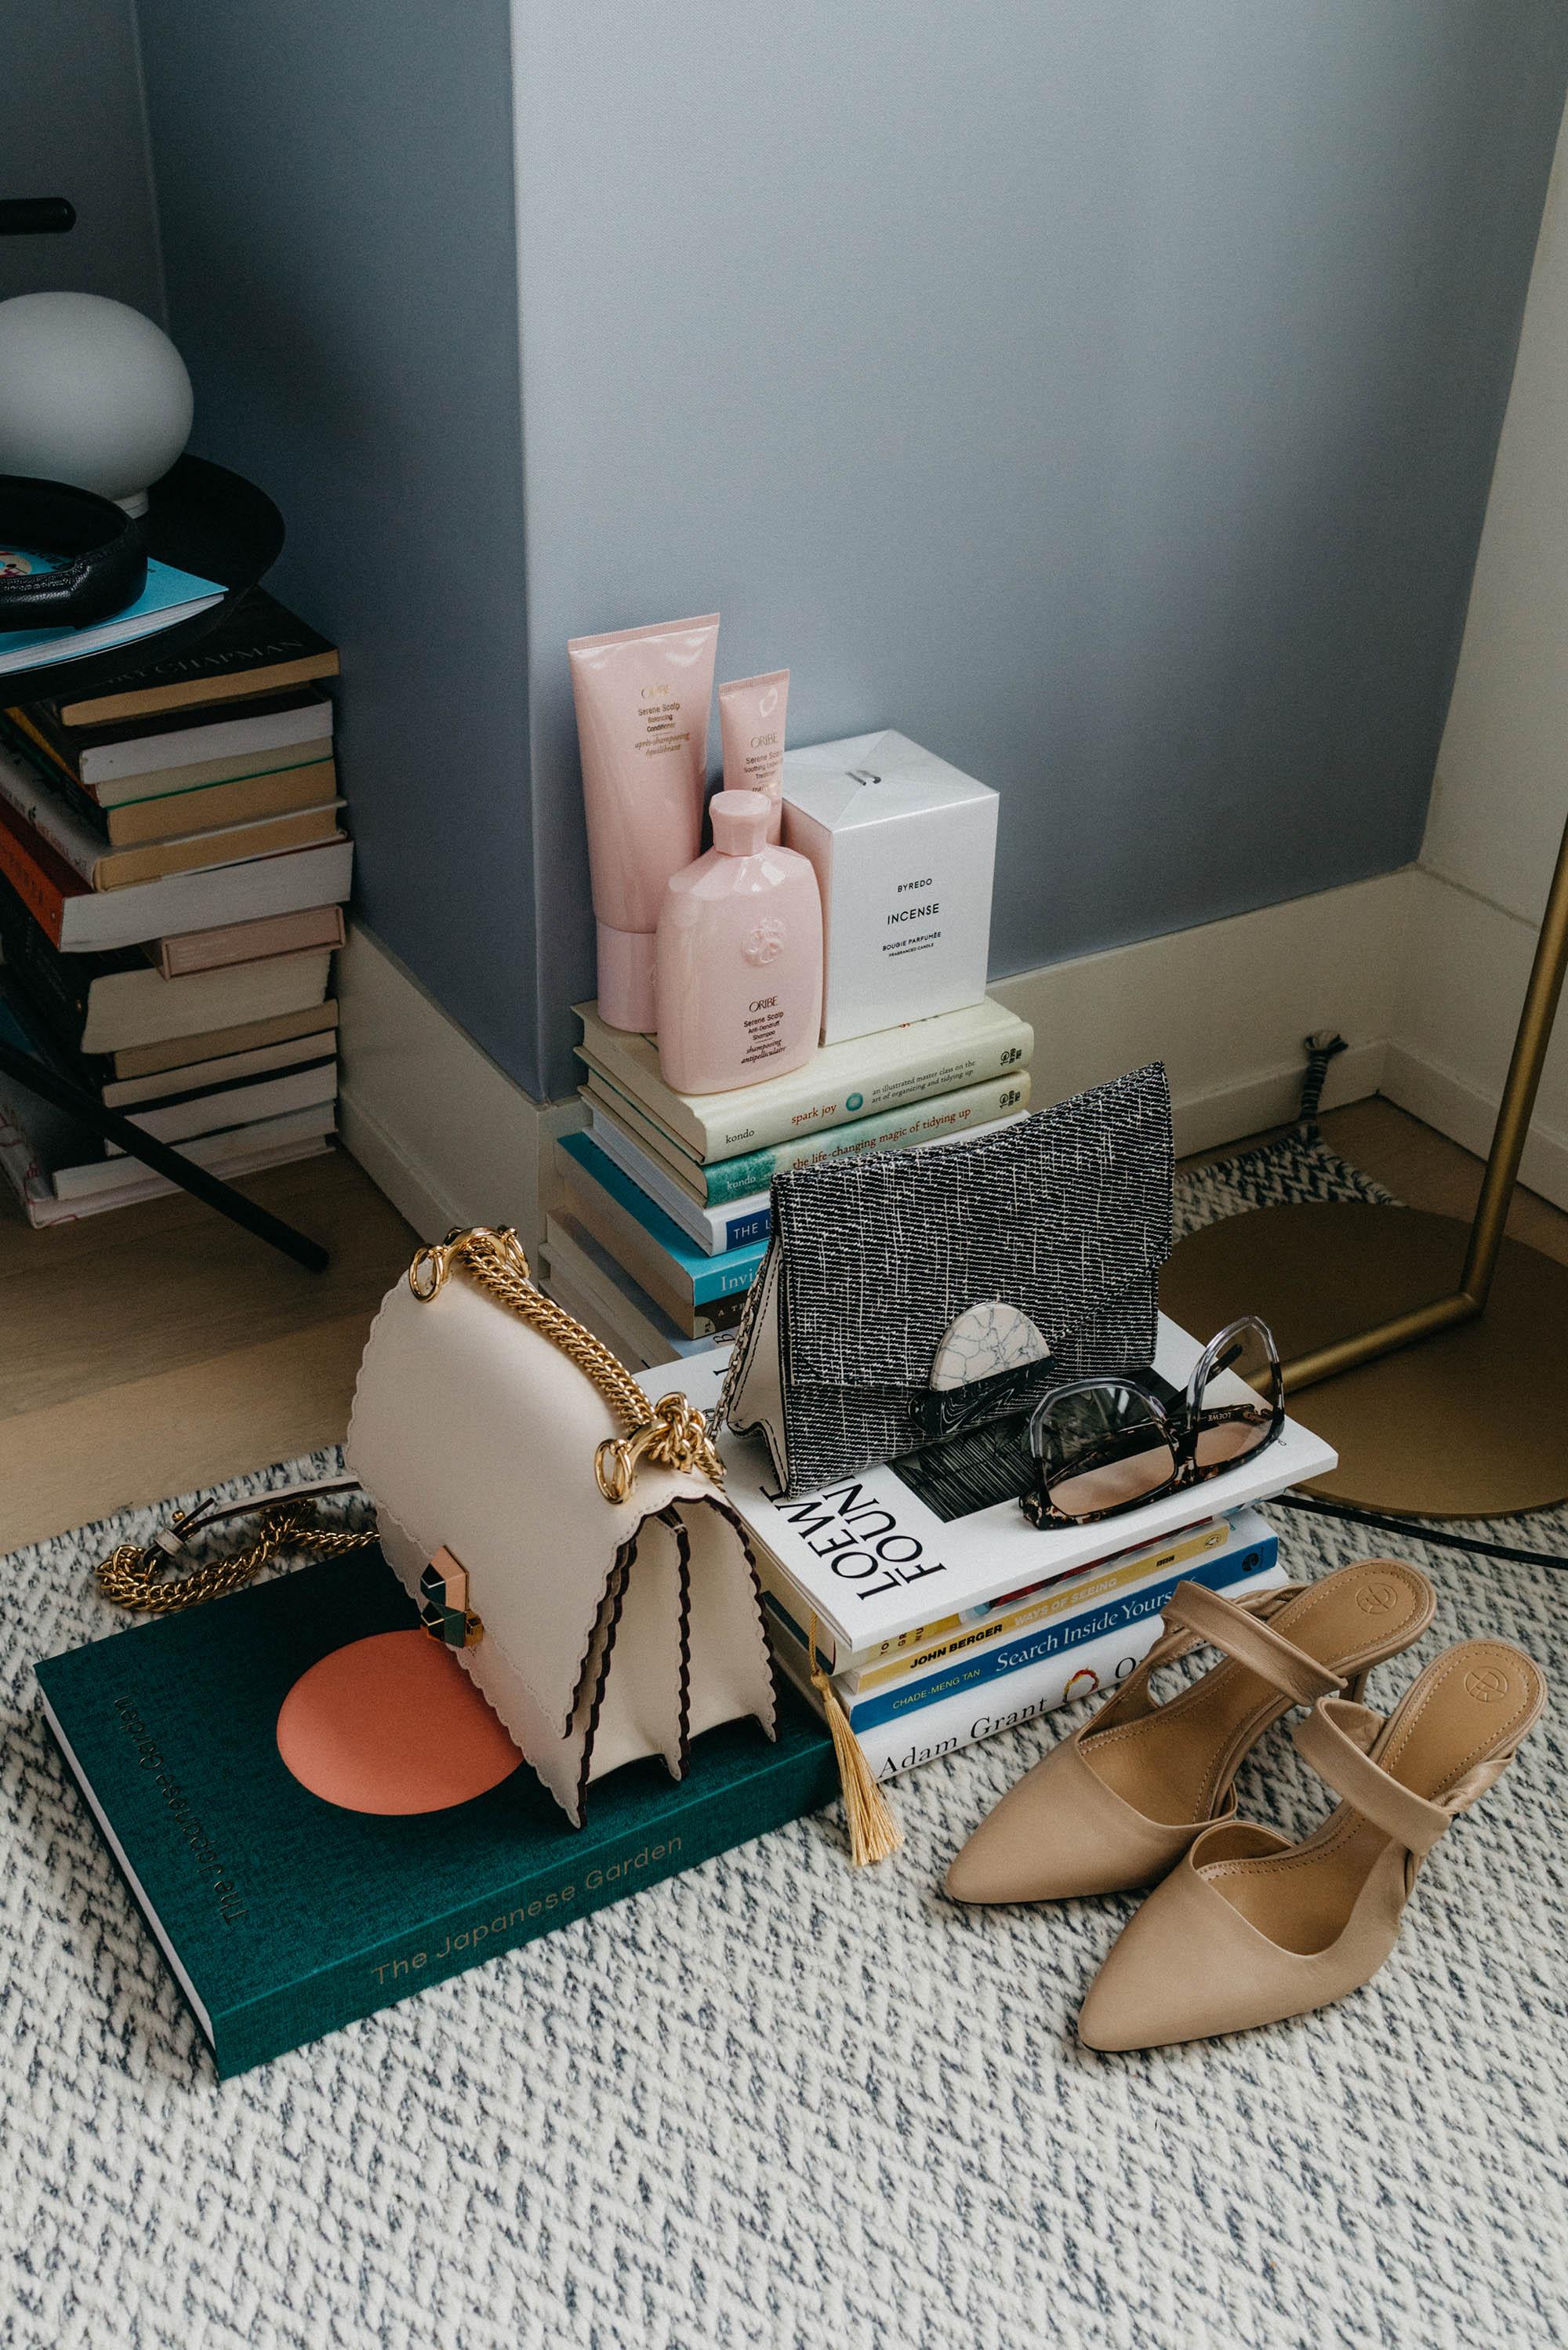 Oribe Haircare ,  Byredo Candle ,  Proenza Schouler Bag , Loewe Sunglasses,  Fendi Bag ,  The Row Shoes ,  The Japanese Garden Book